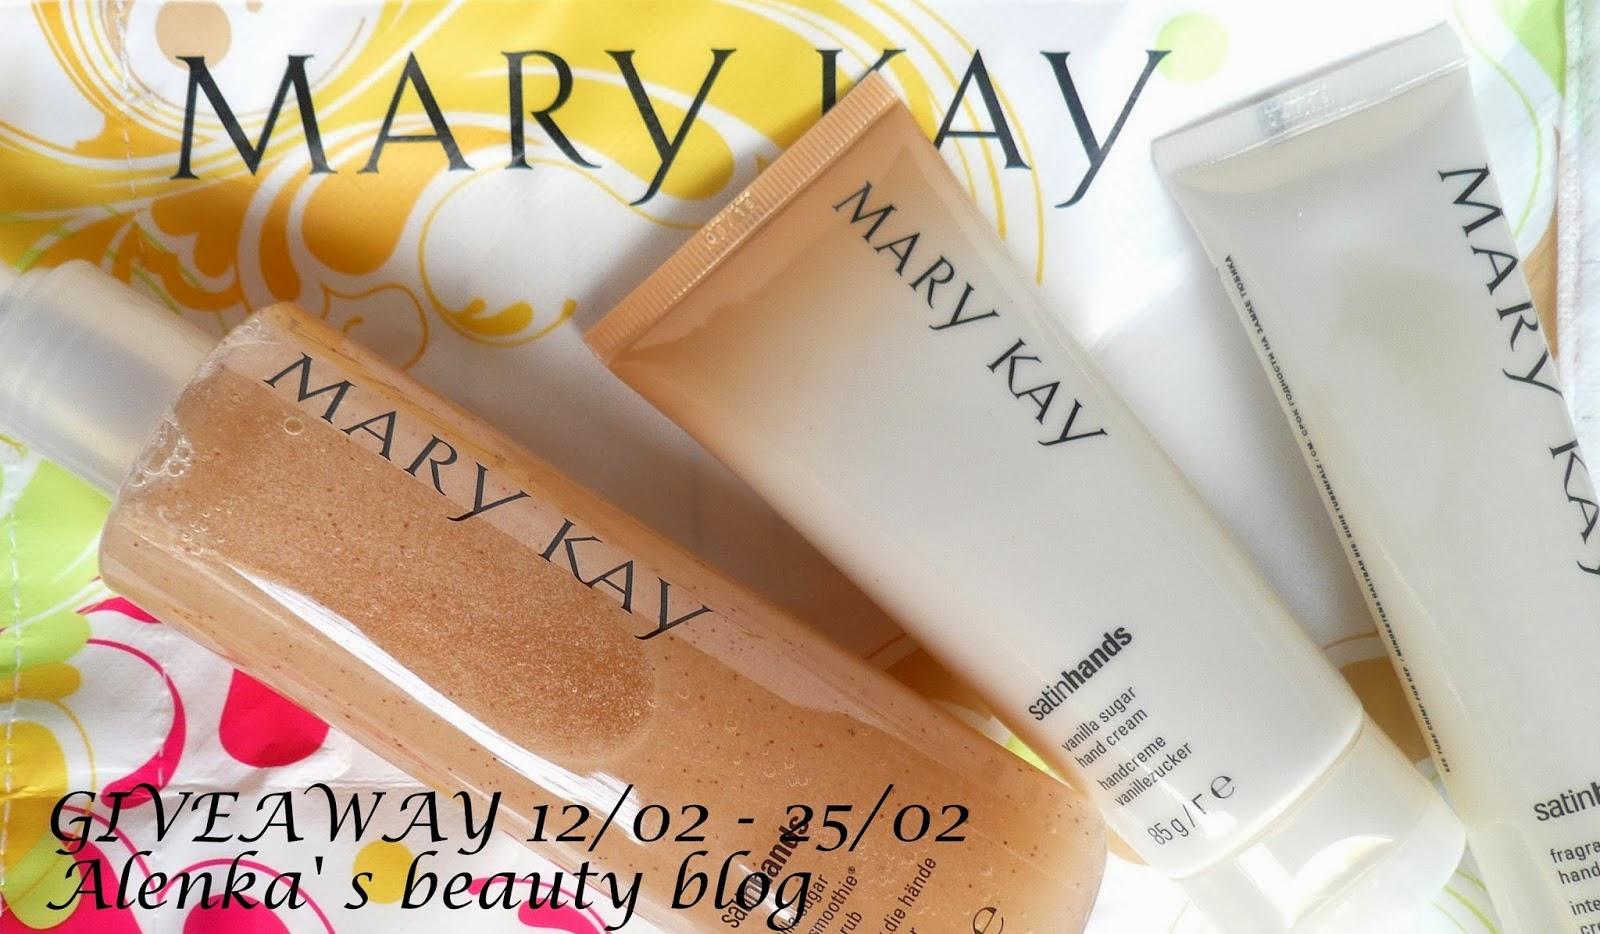 http://alenaalenka.blogspot.com/2014/02/giveaway-vanila-sugar-satinhands-mary.html